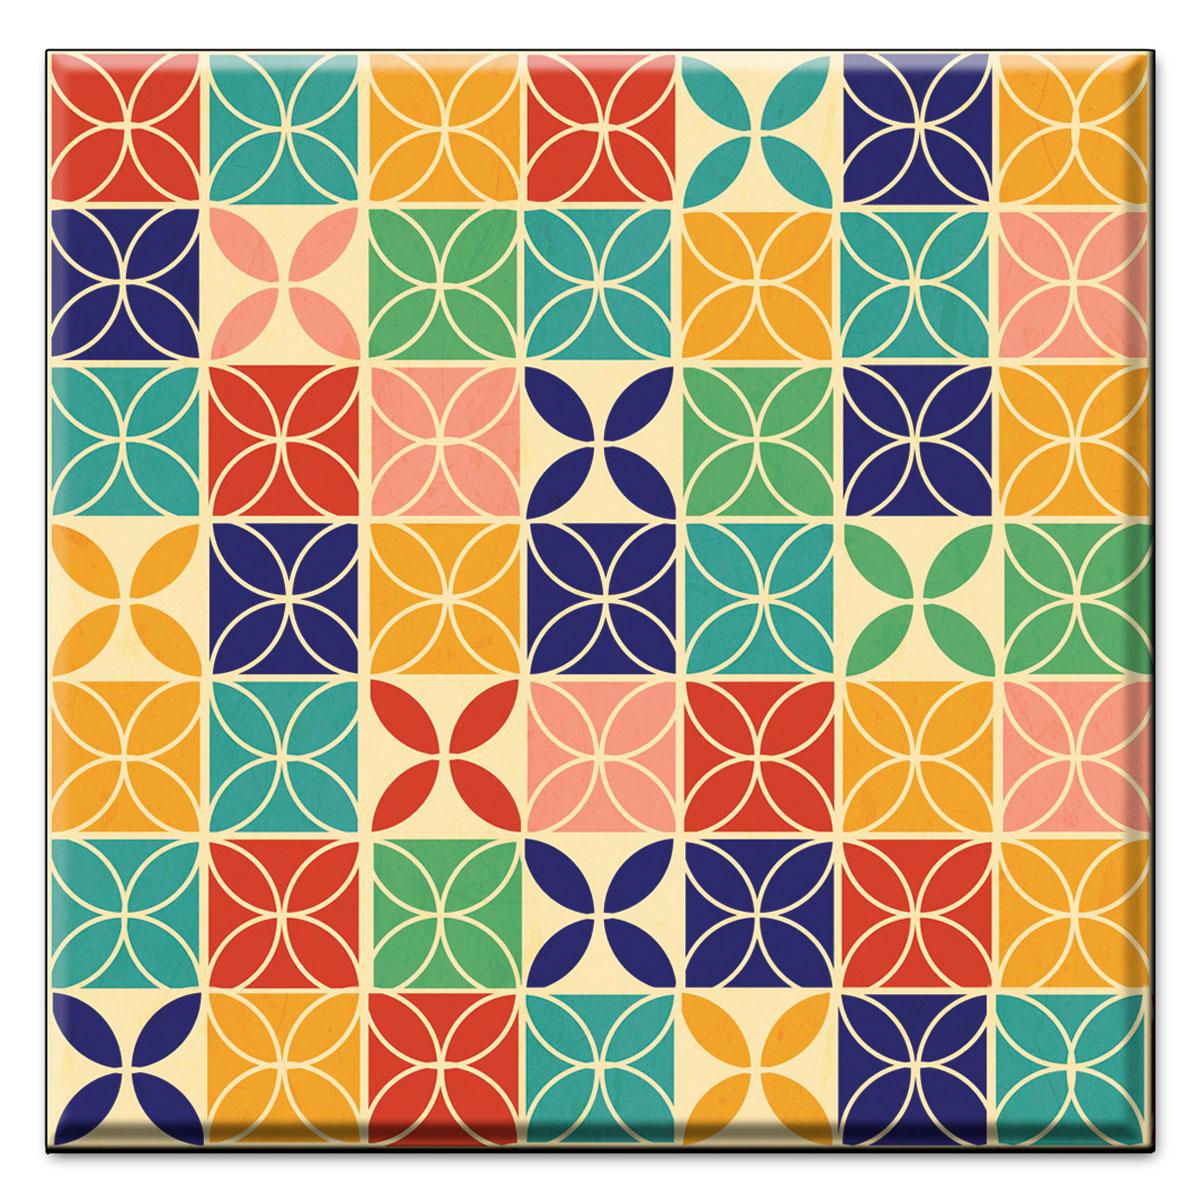 Подставка под кружку Magic Home, 9,3 х 9,3 см. 4342143421